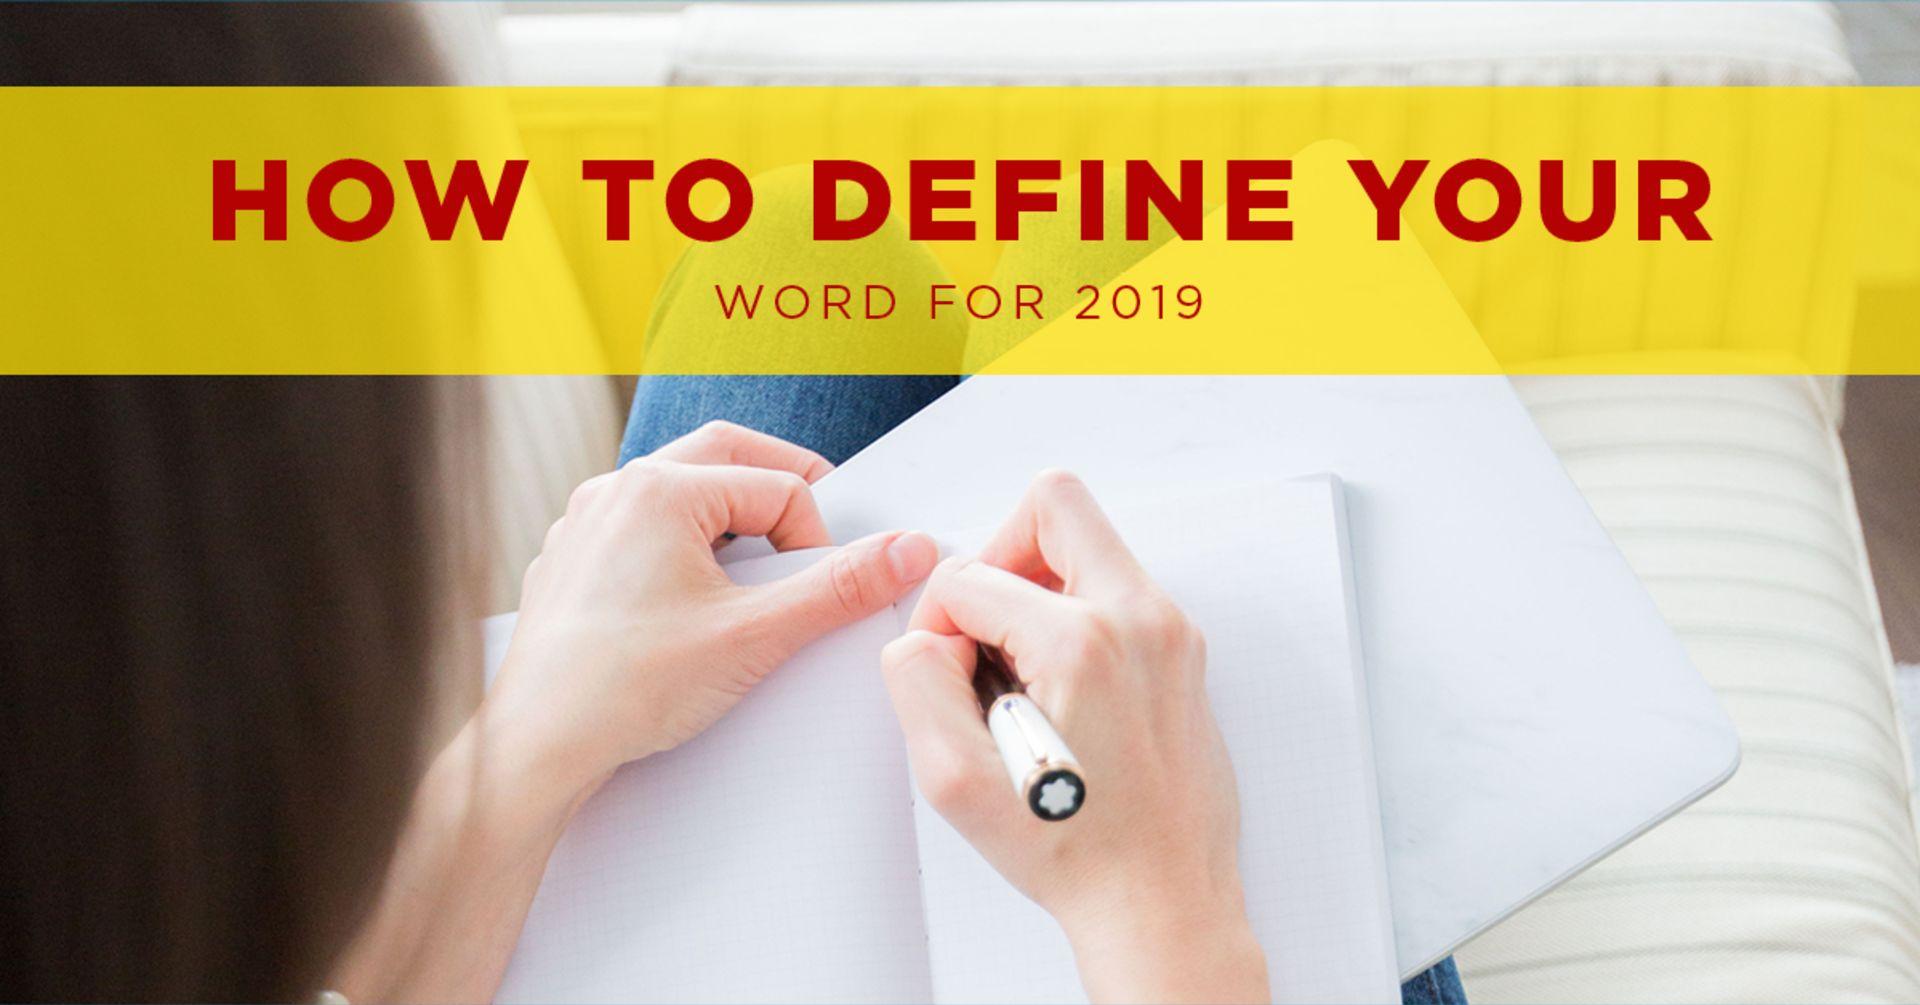 Define your 2019